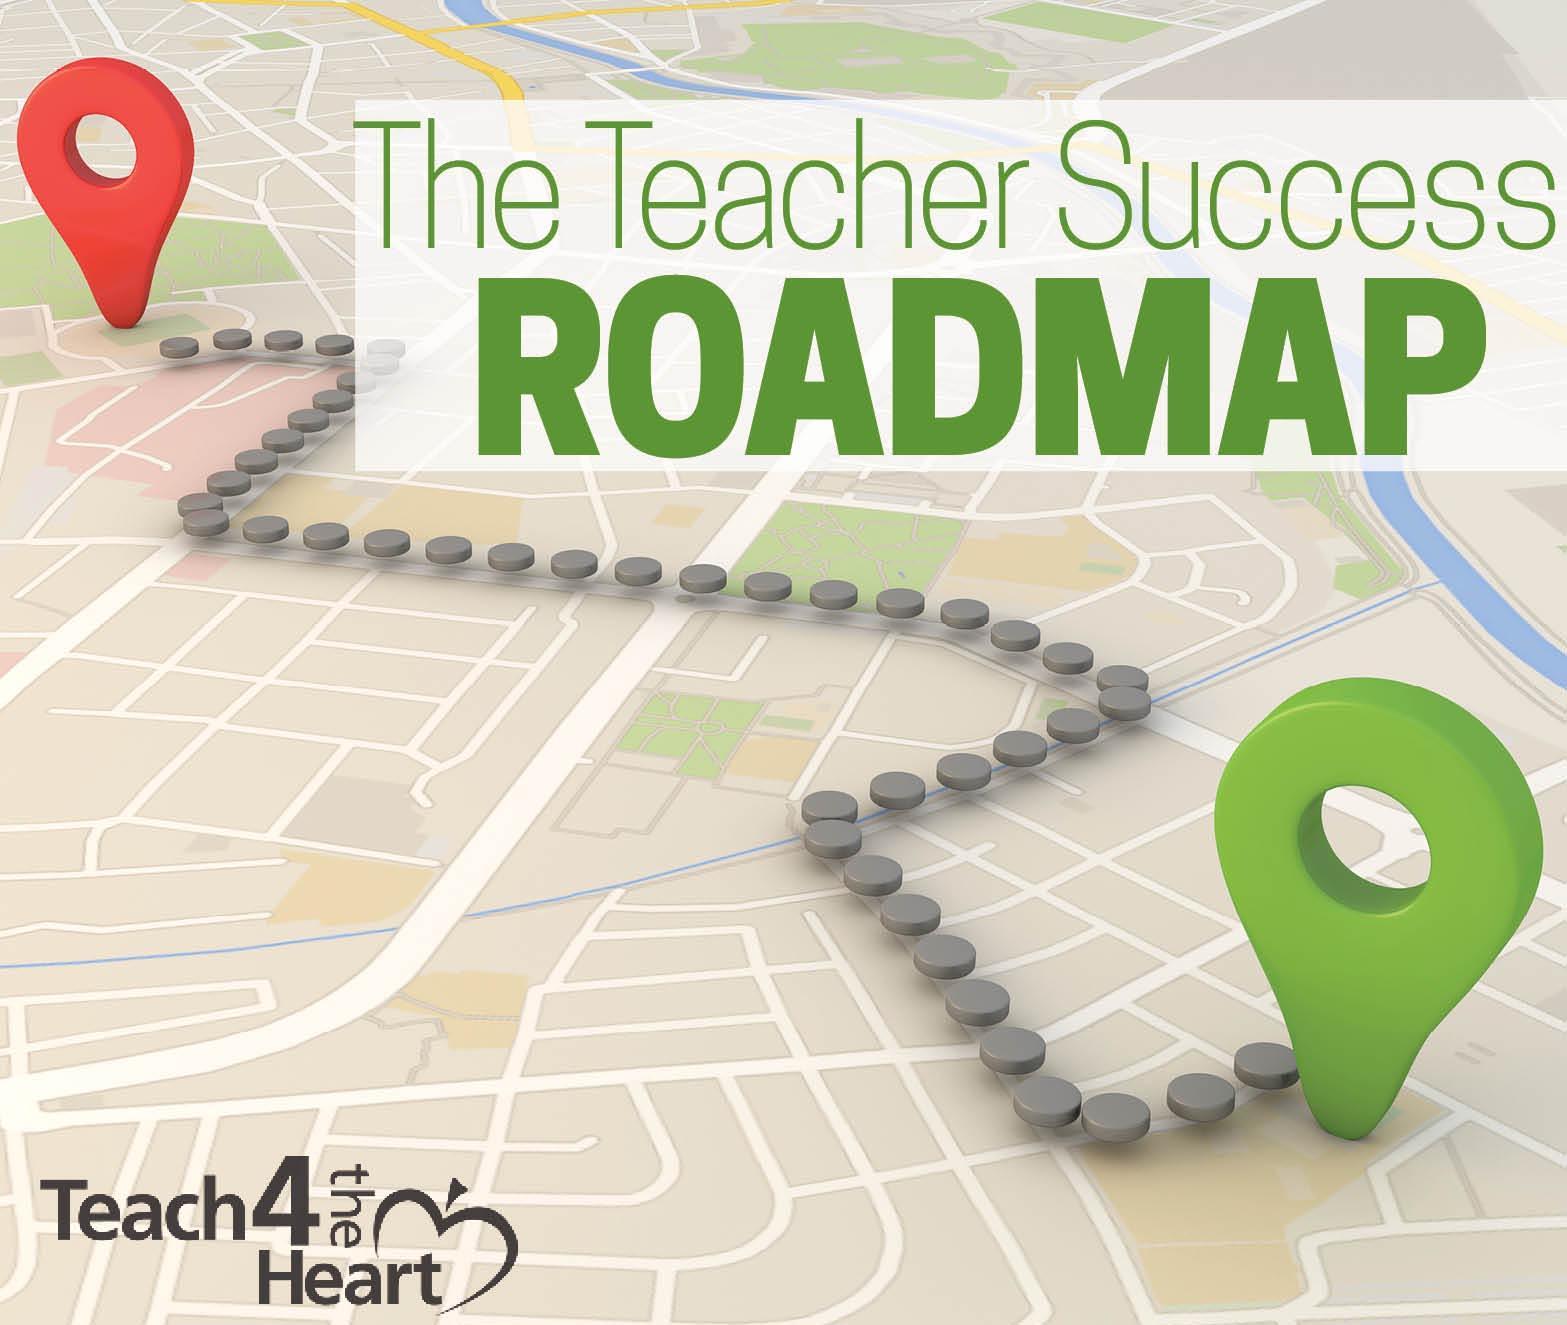 the teacher success roadmap teach 4 the heart